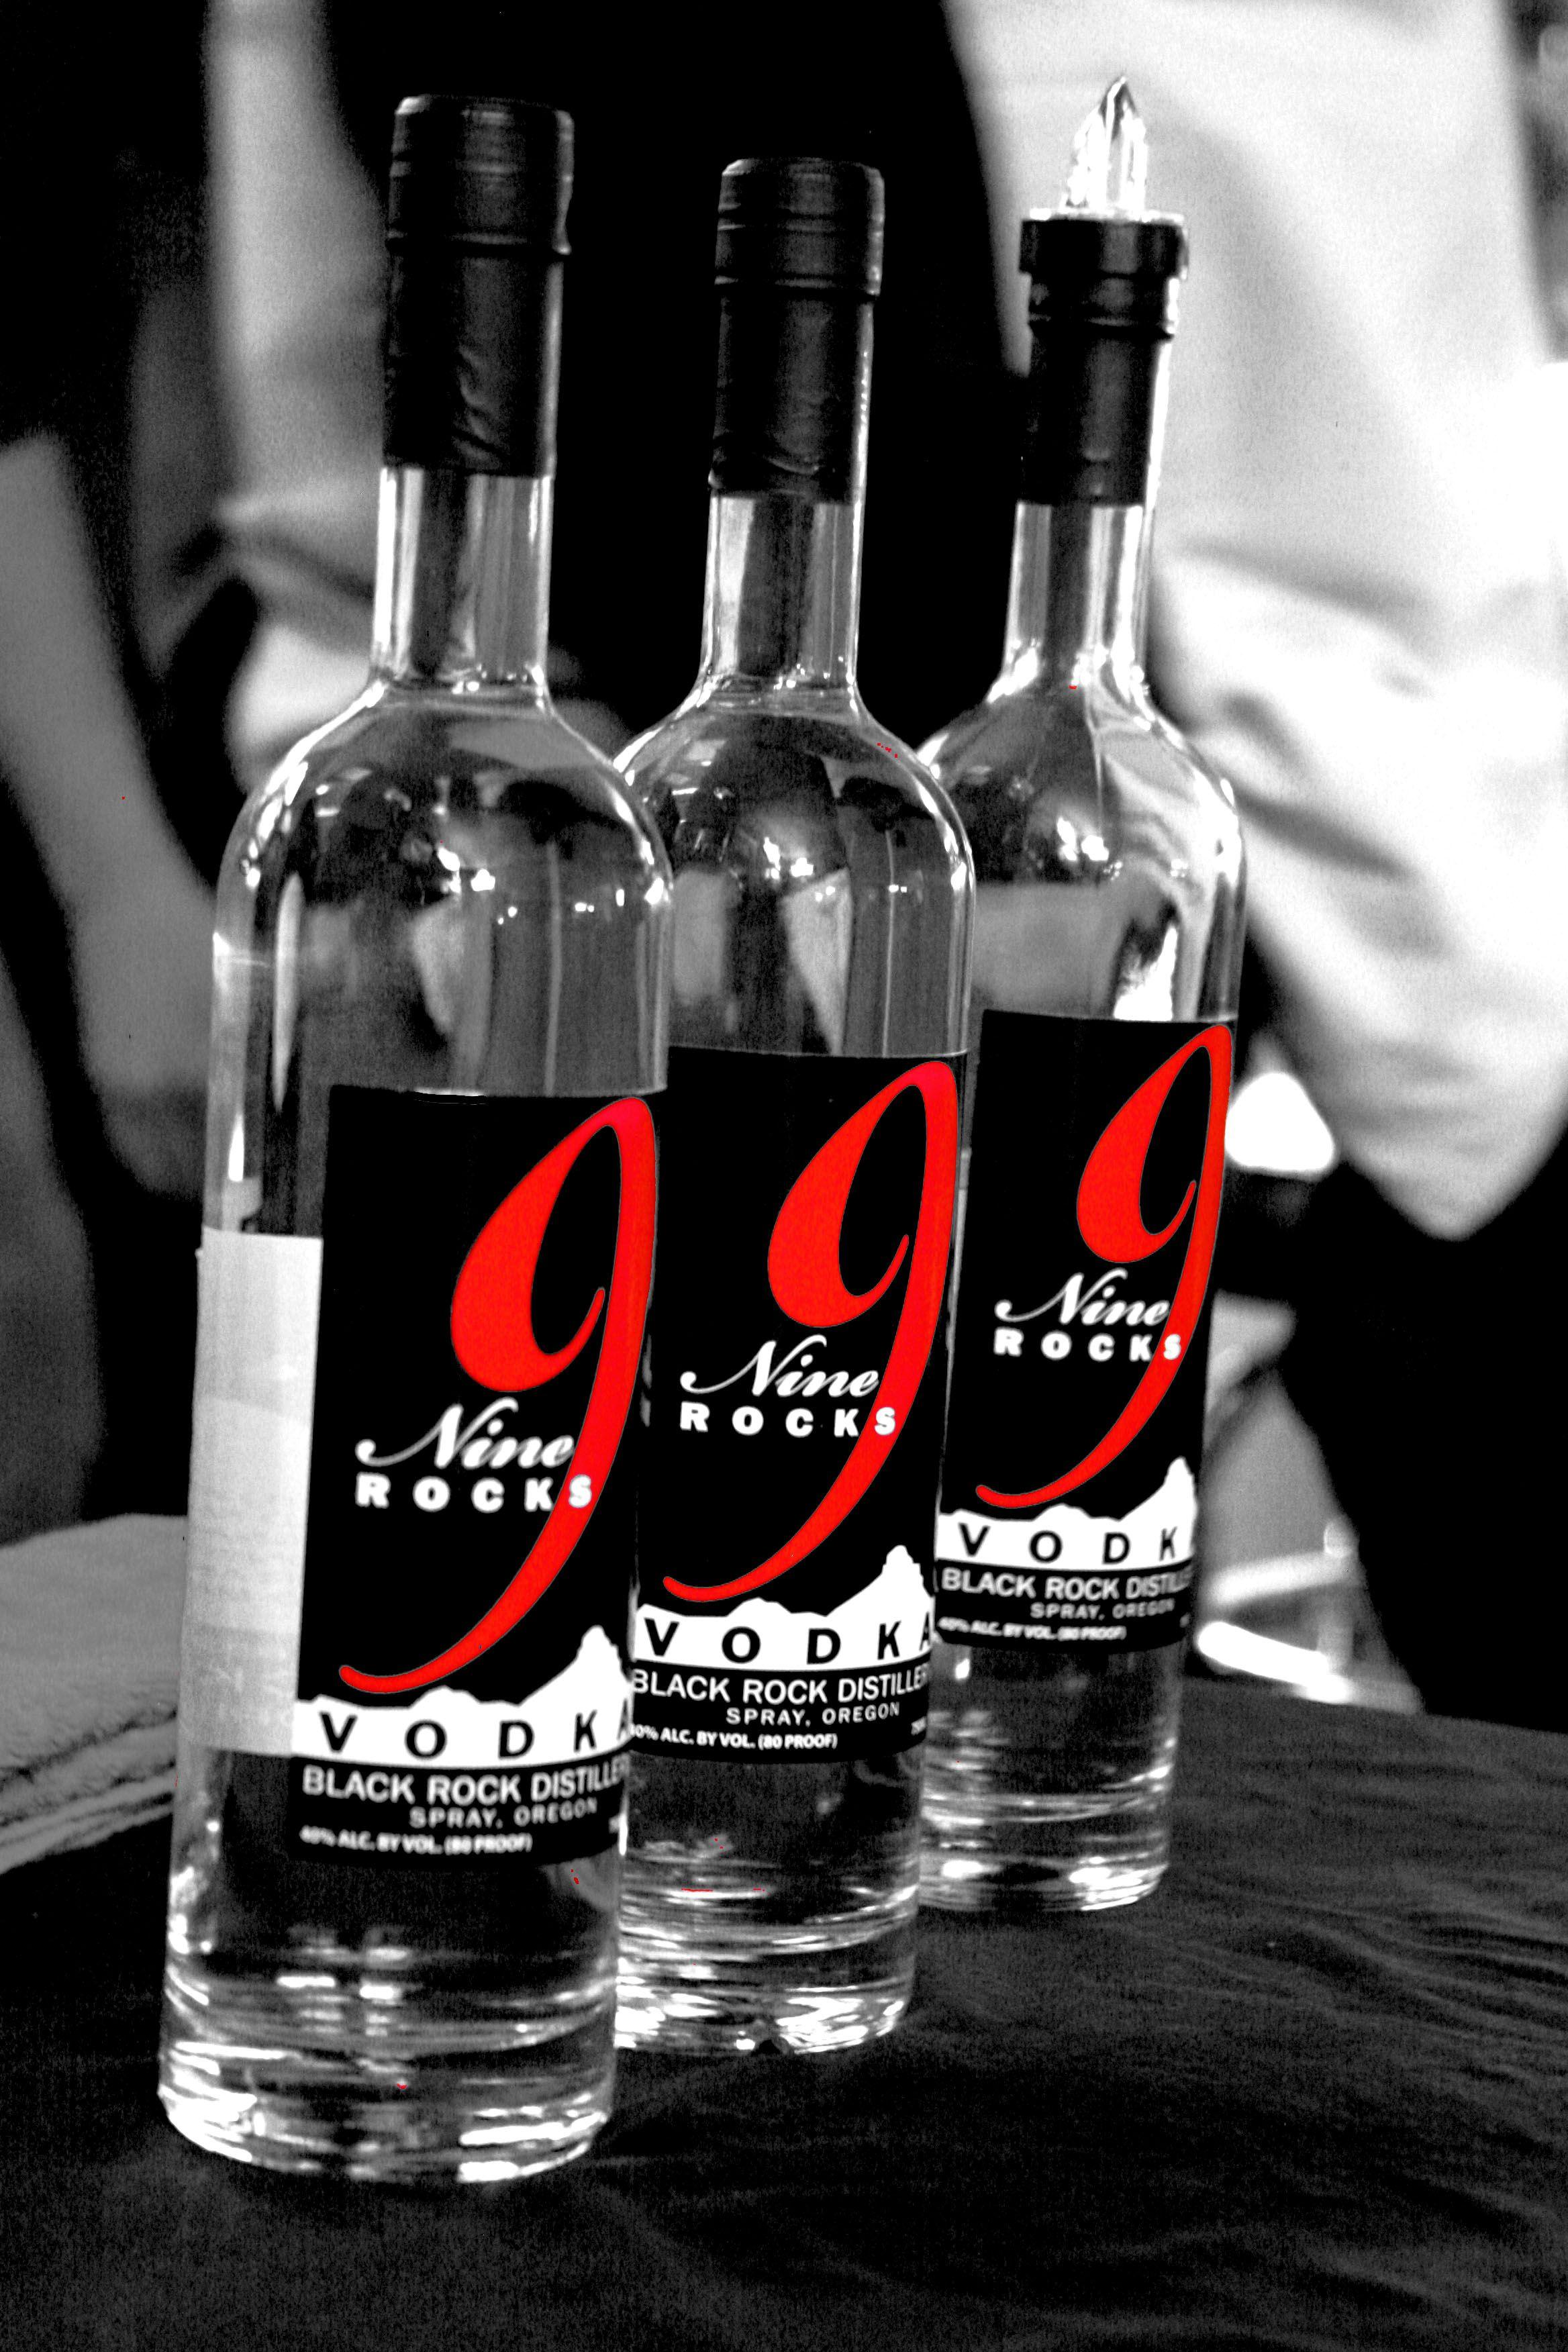 9 rocks vodka made in spray OR 100 GLUTEN FREE (leading